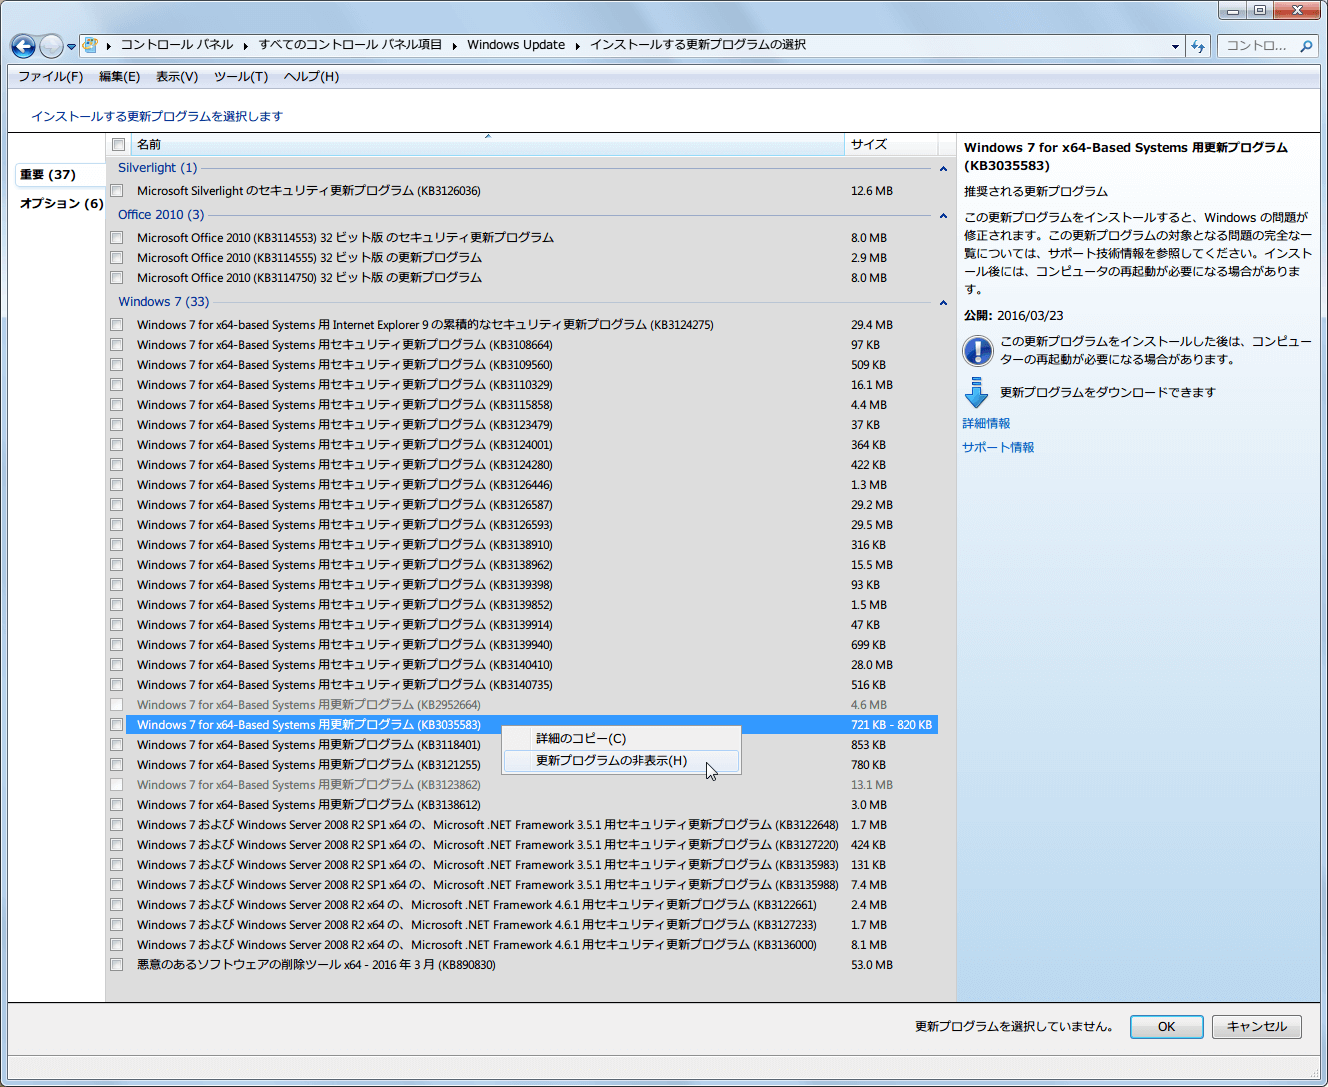 Windows 7 64bit Windows Update 重要 2016年3月23日公開 KB 更新プログラムの非表示